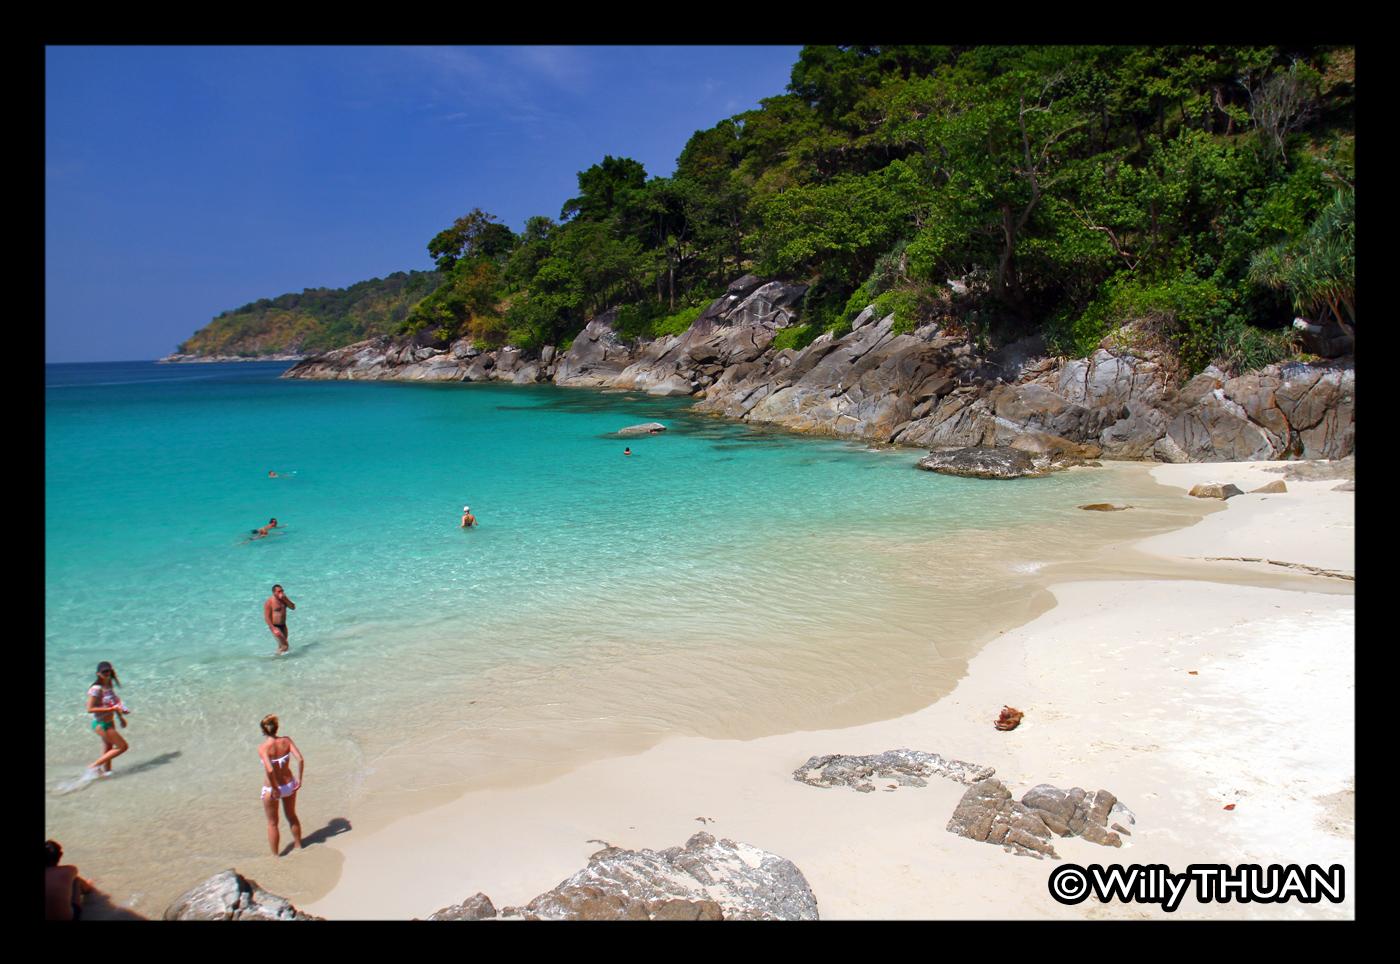 Free beach freedom beach nudism naturalist video 5